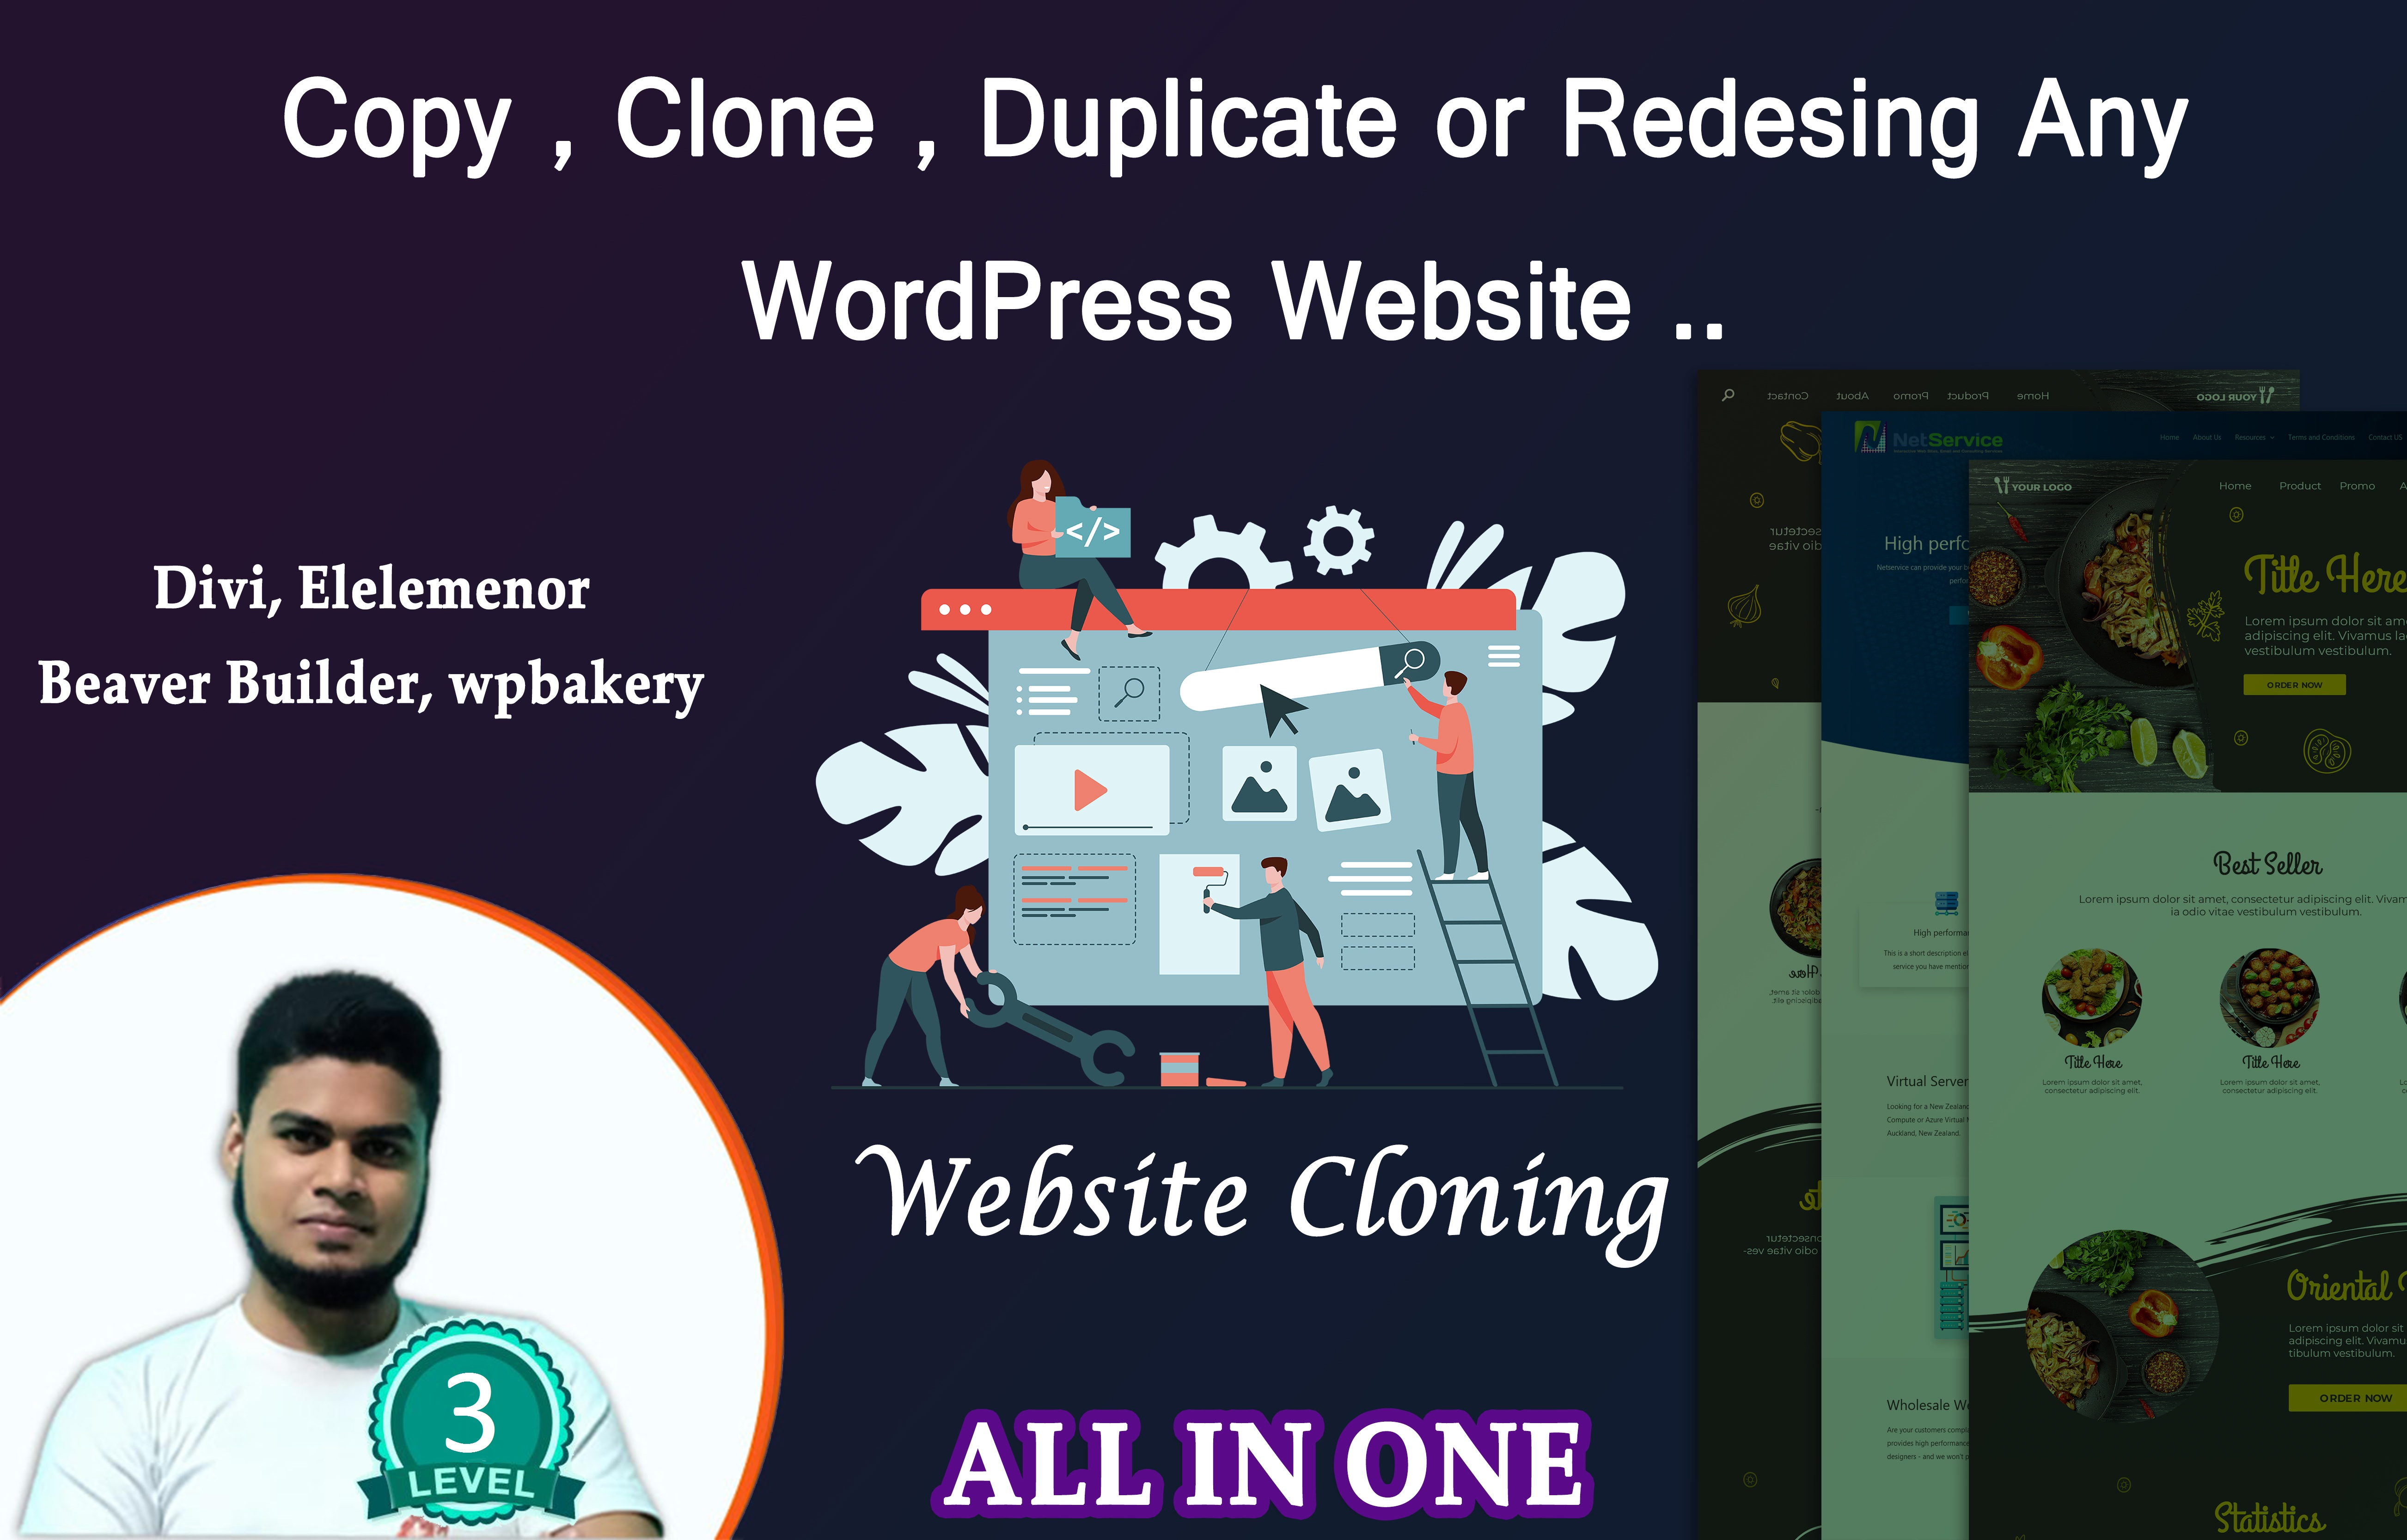 I will copy clone redesign any website design